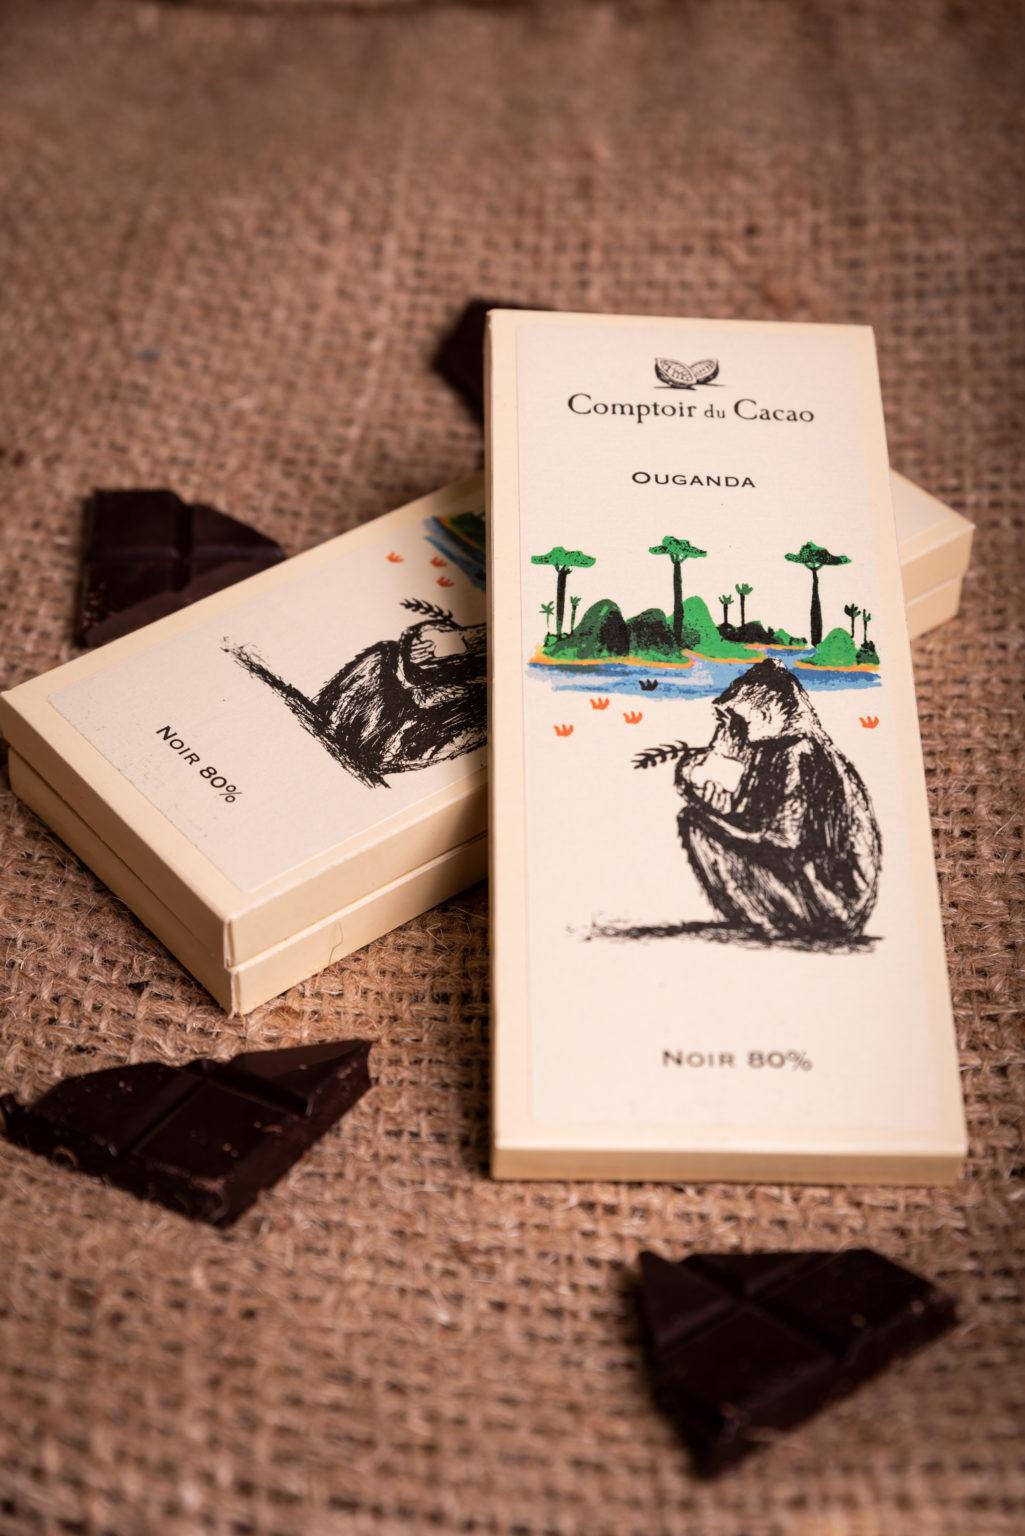 Tablette de chocolat Ouganda du comptoir du cacao